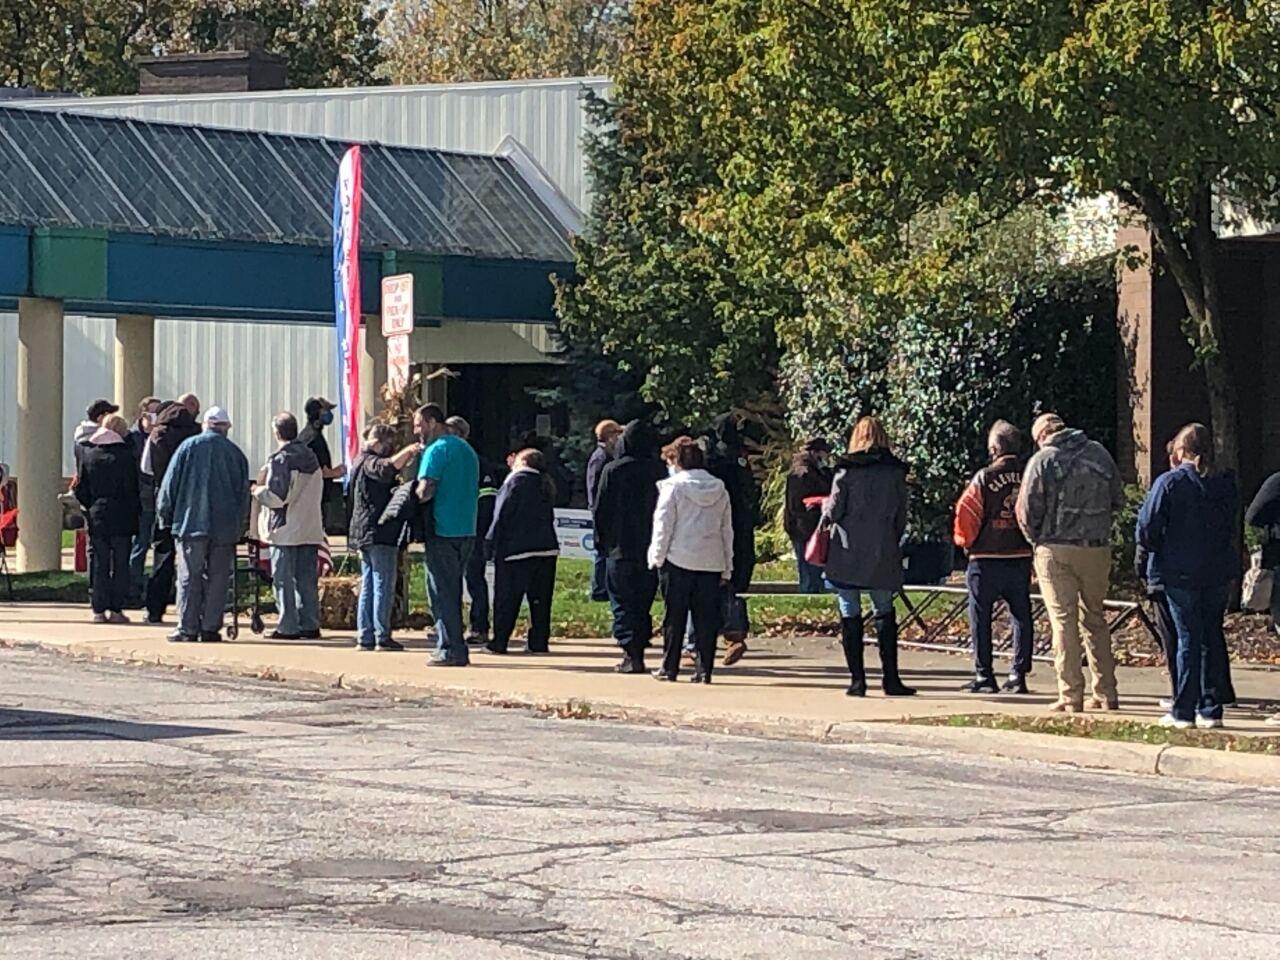 Brook Park Rec Center voting